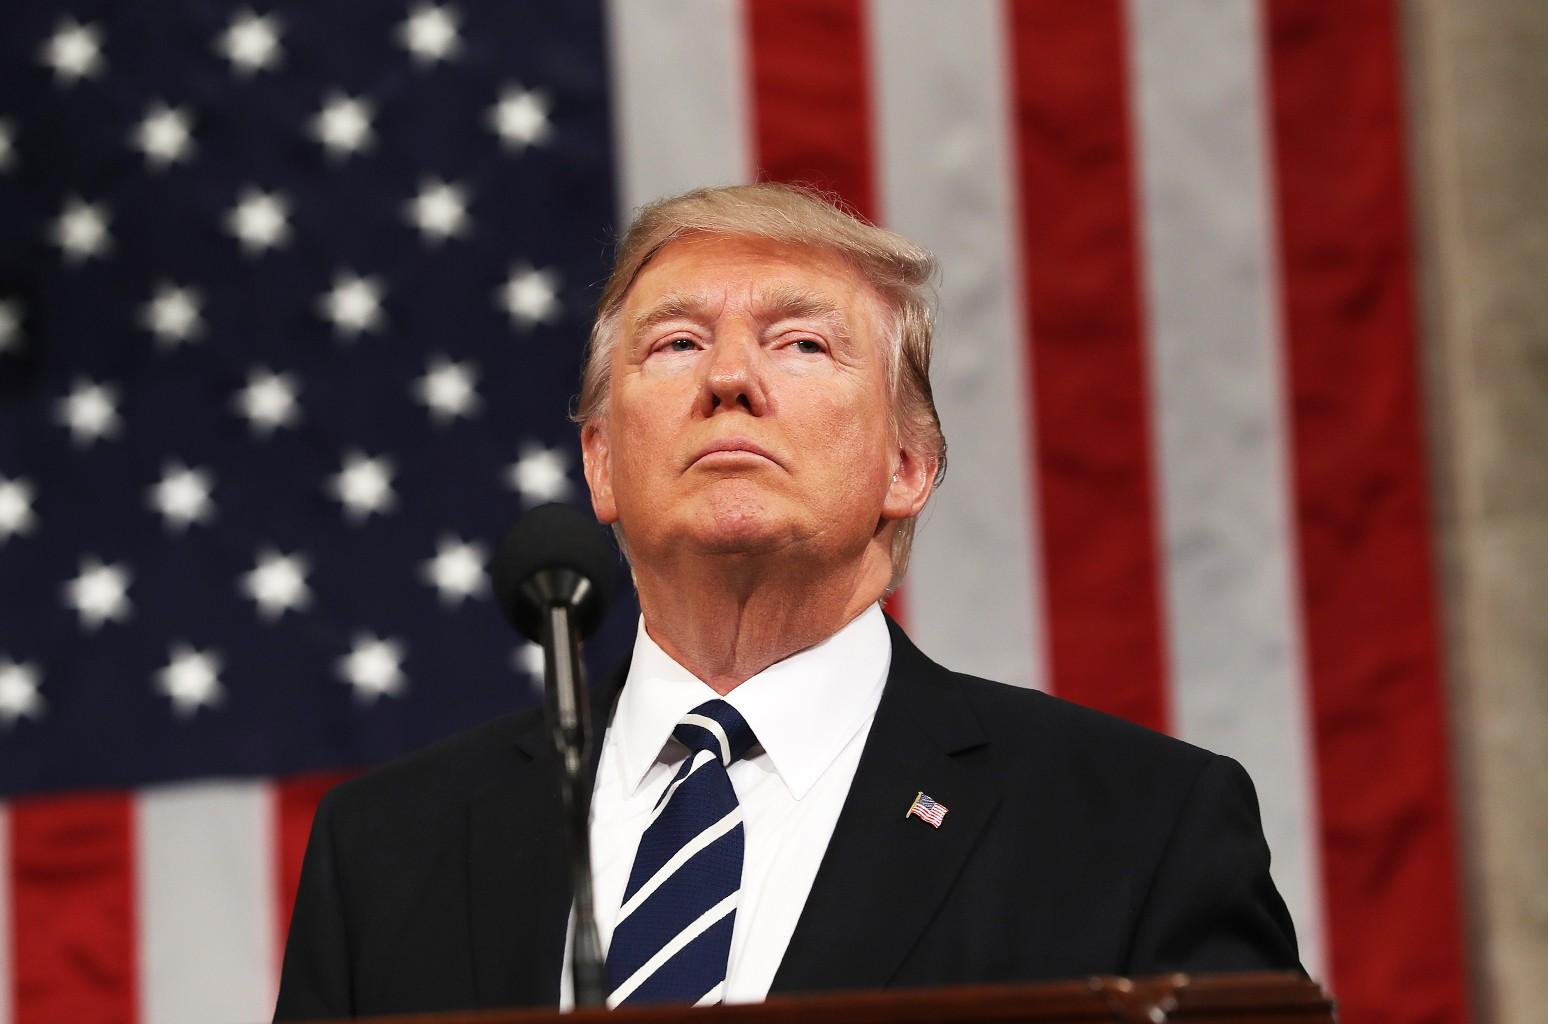 President Donald J. Trump photographed on Feb. 28, 2017 in Washington, DC.